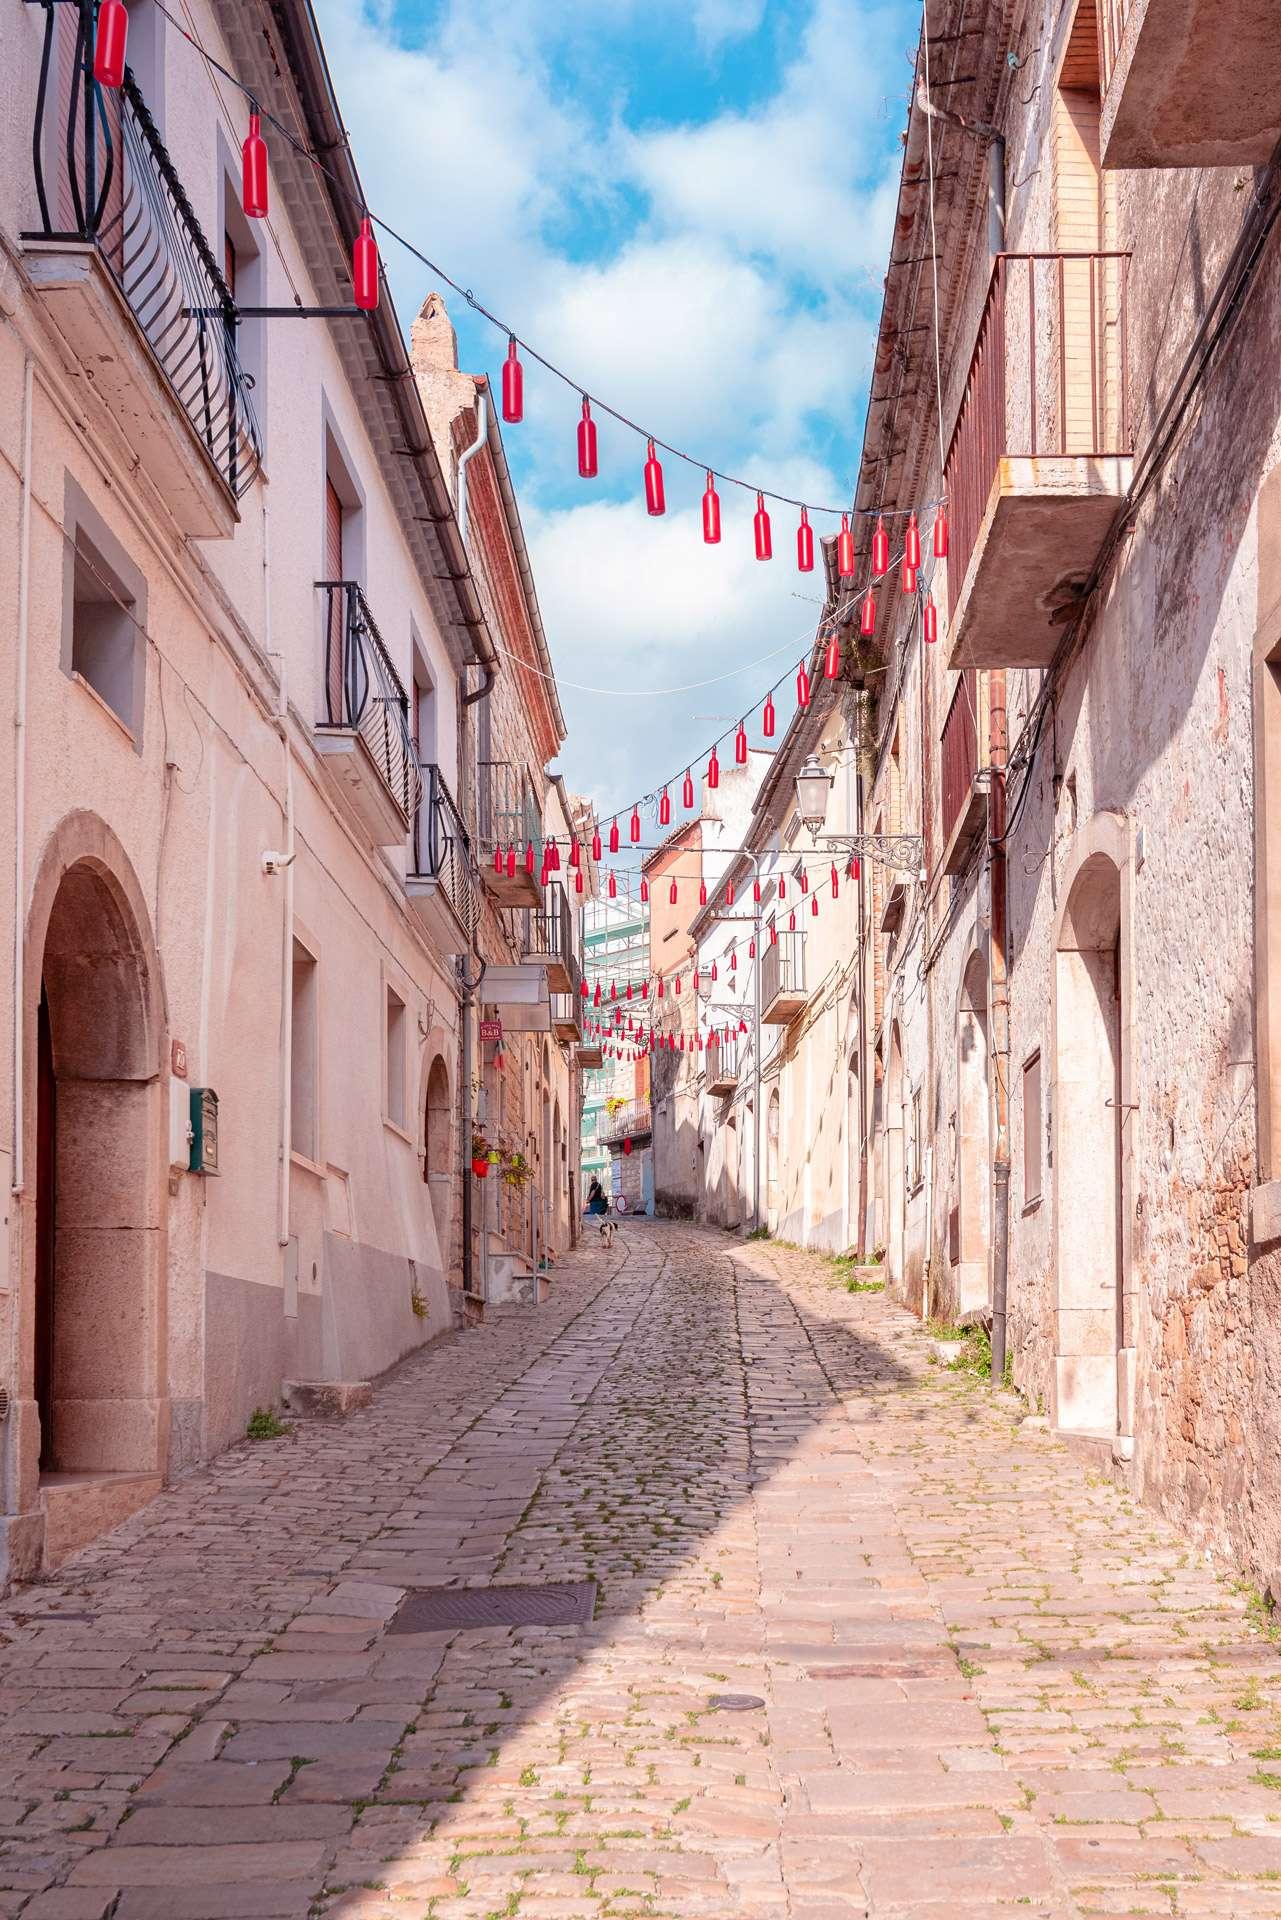 Narrow street in Orsara di Puglia